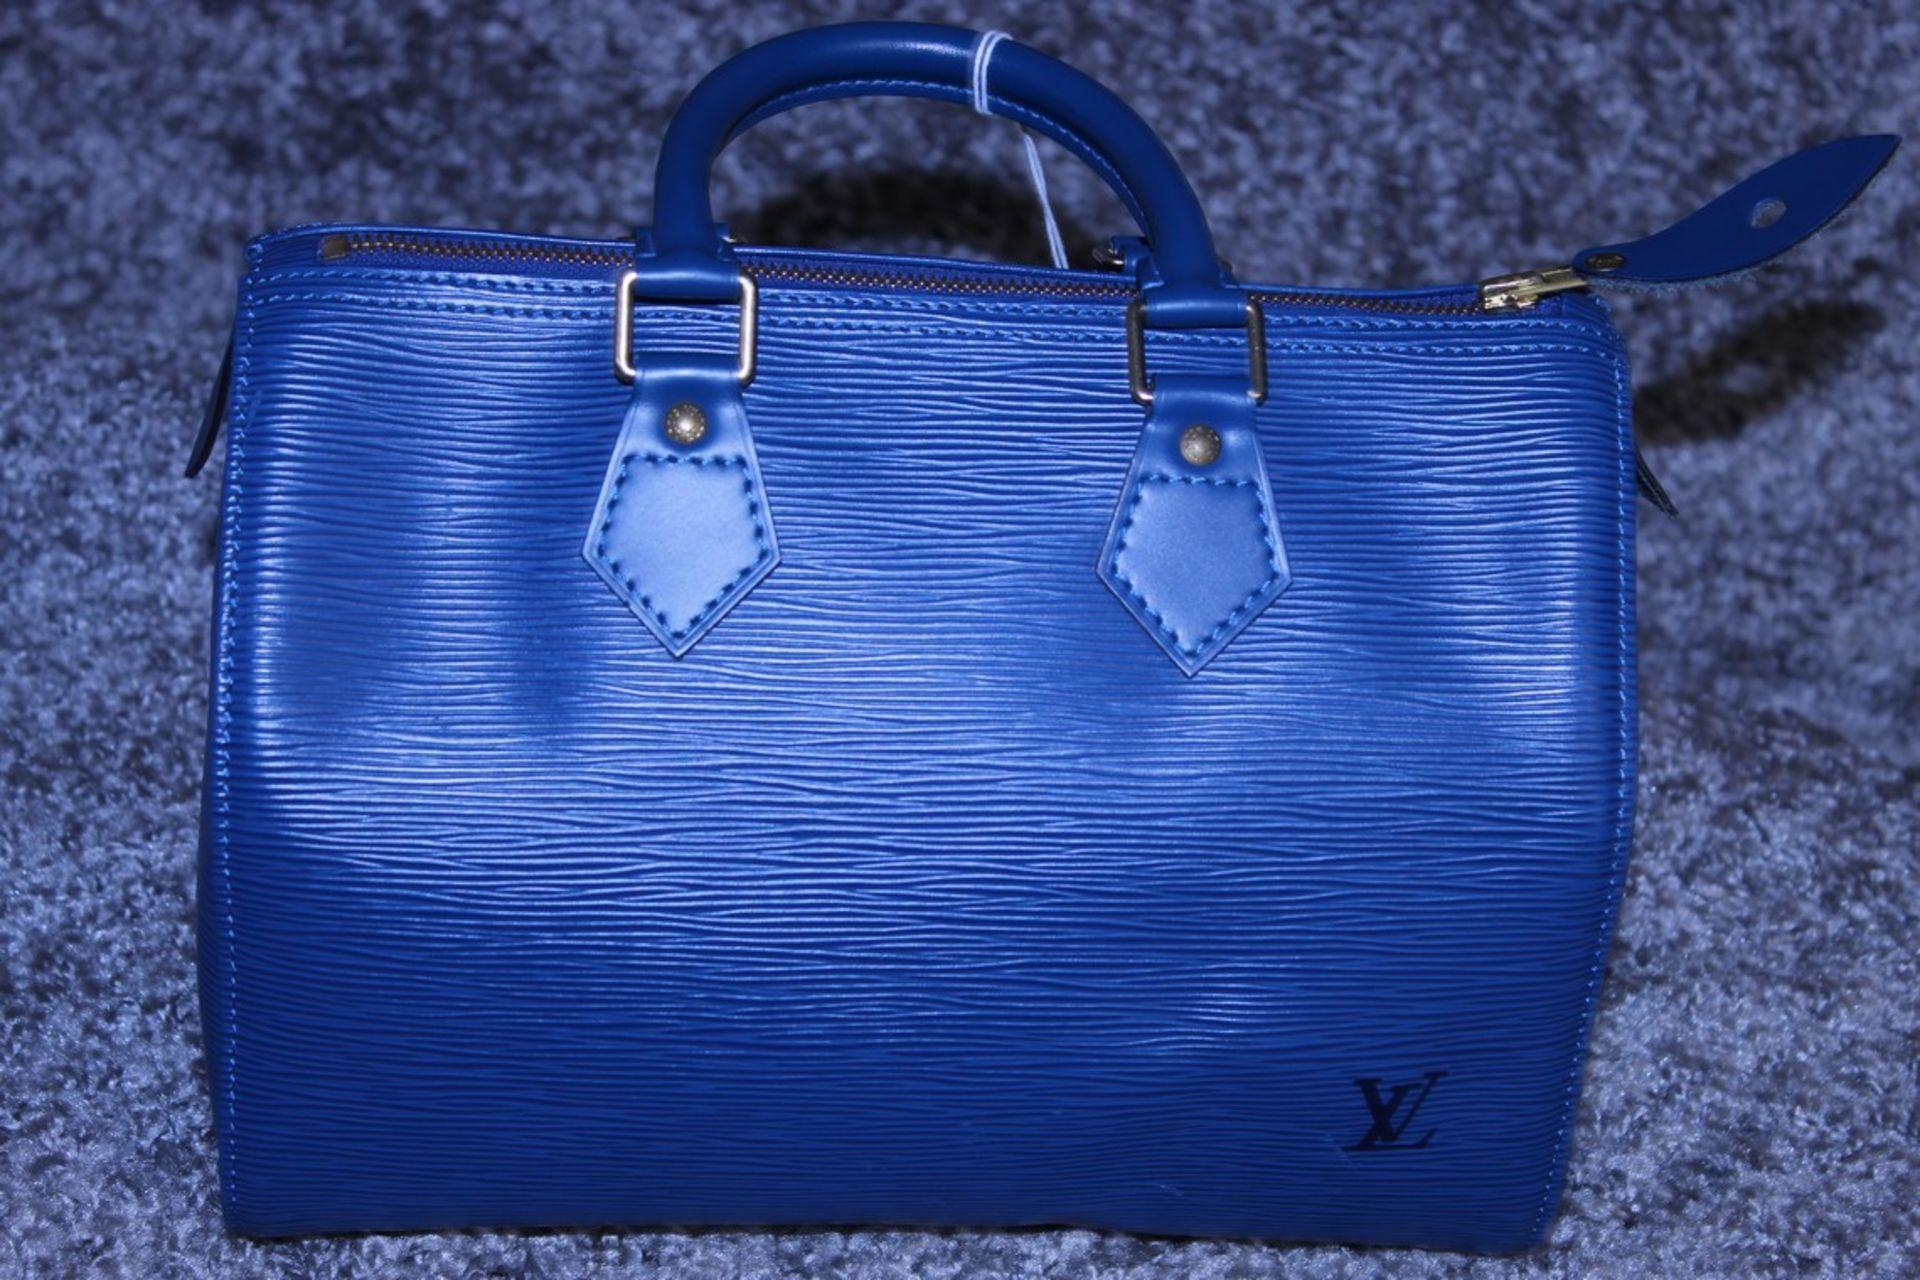 RRP £1,000 Louis Vuitton Speedy 25 Handbag, Blue Epi Calf Leather, 27X19X15Cm (Production Code - Image 2 of 3